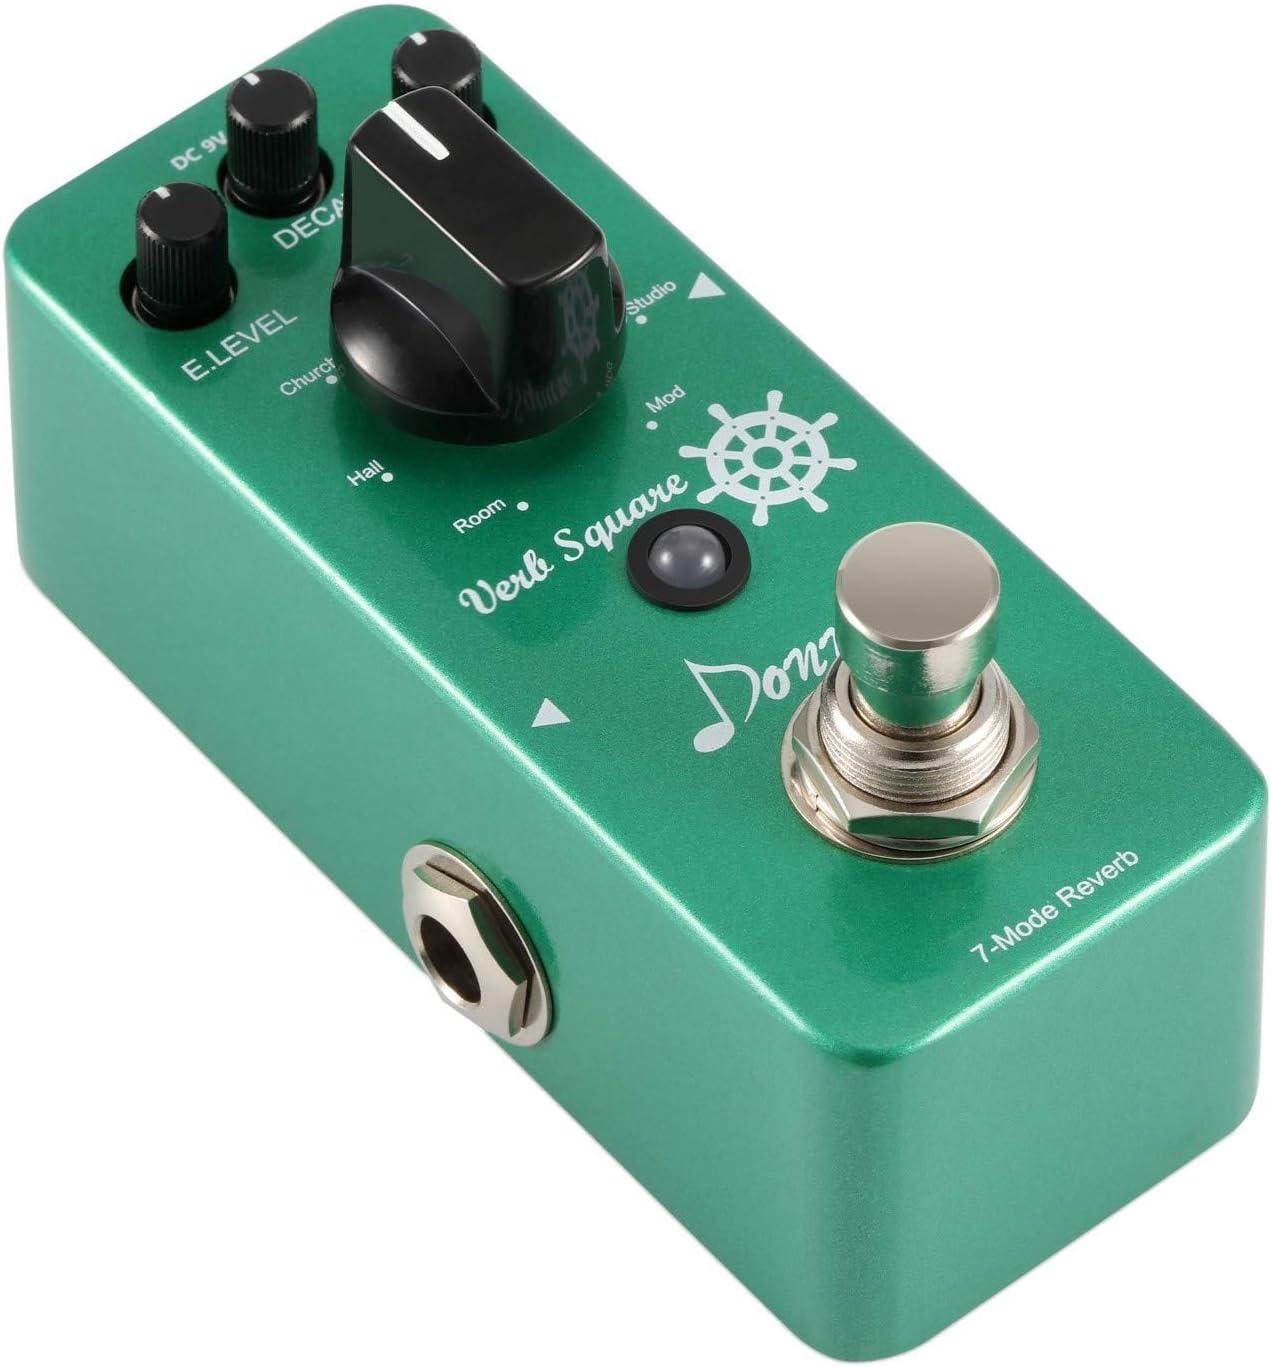 Donner Reverb Guitar Pedal, Verb Square Digital Reverb 7 Modes Room, Hall, Church, Spring, Plate, Studio, Mod, True Bypass